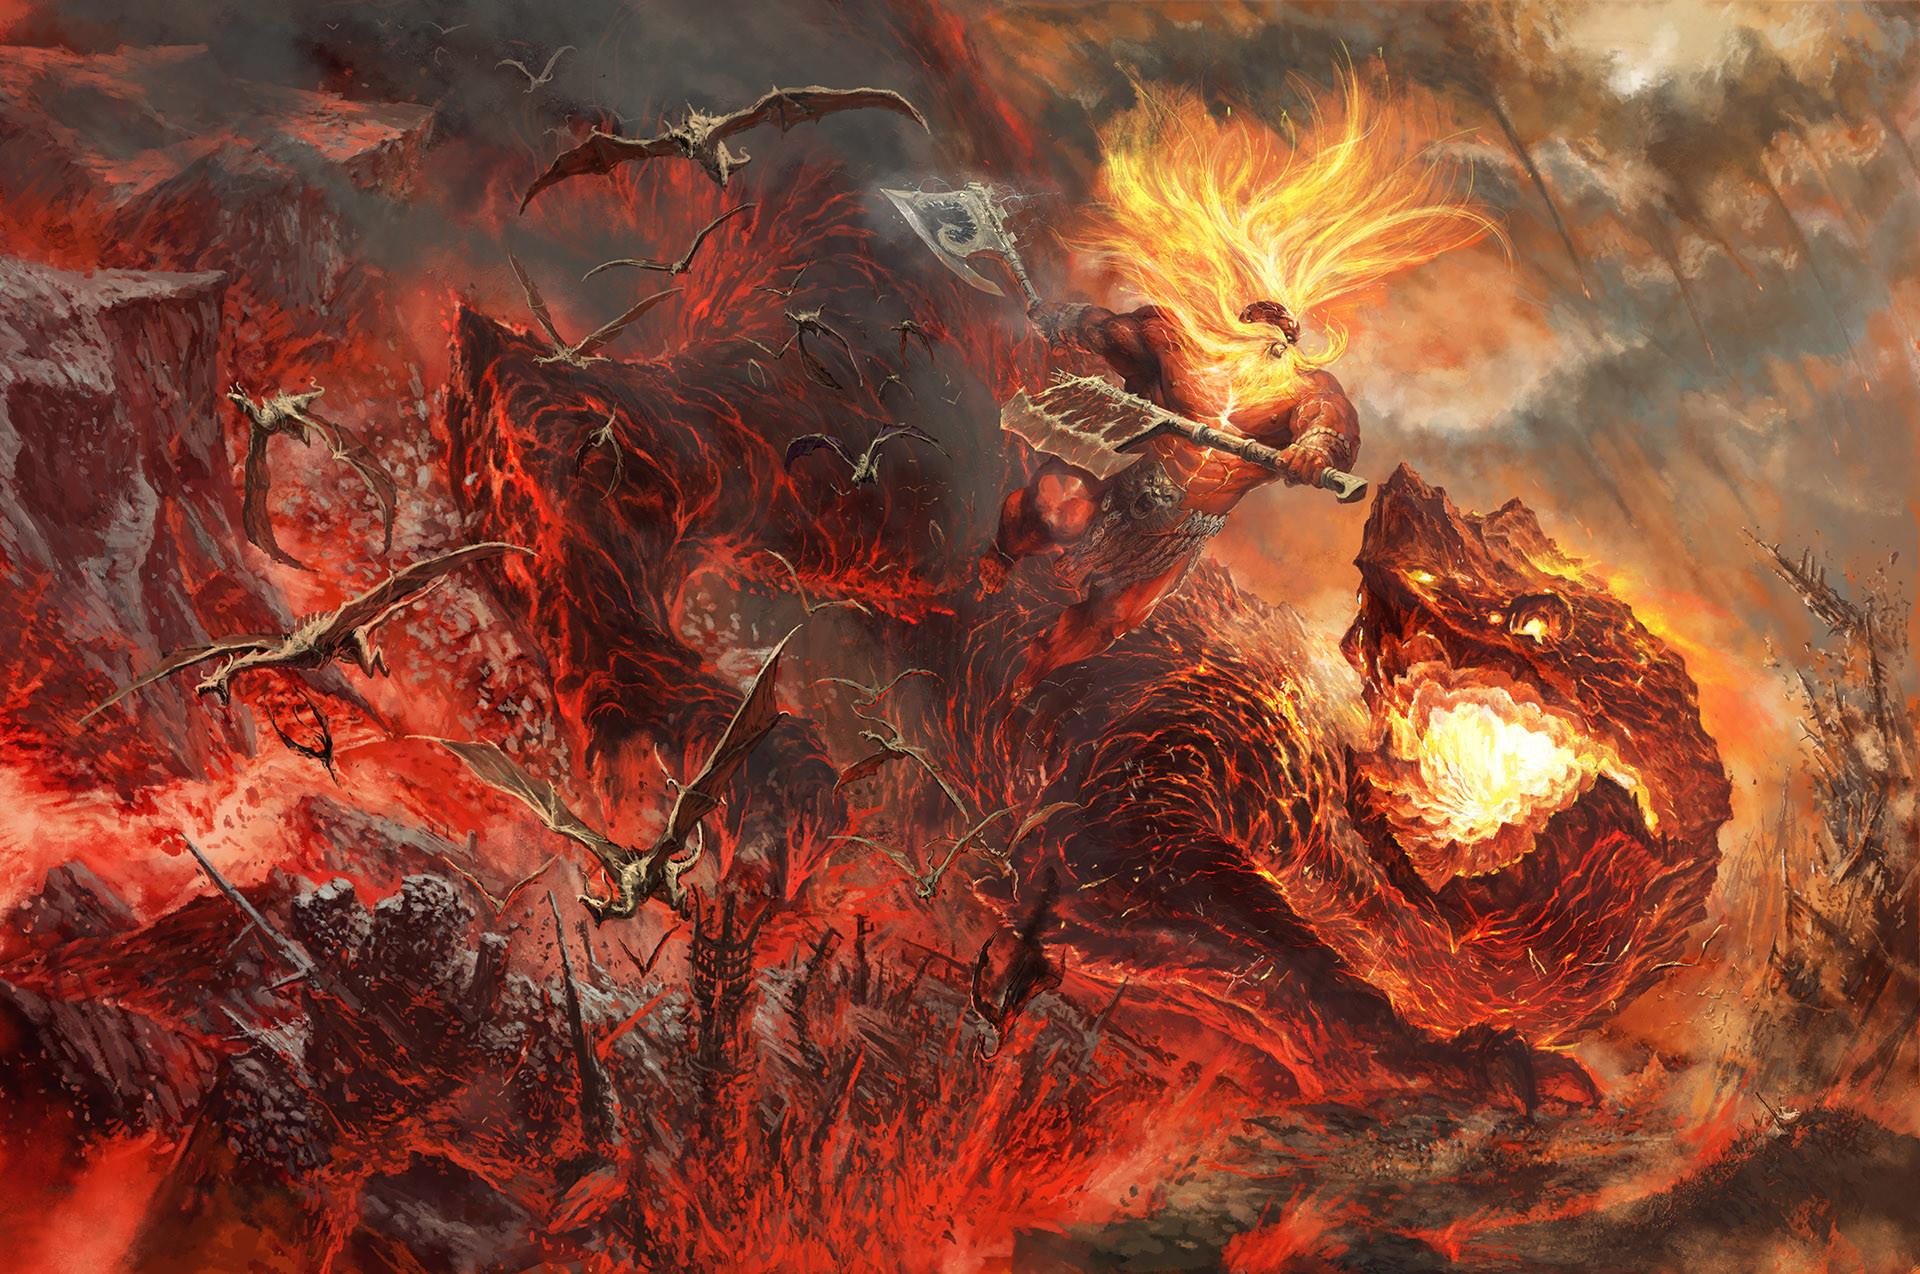 Tze Kun Chin 陈志堃 - Grimnir vs Vulcatrix